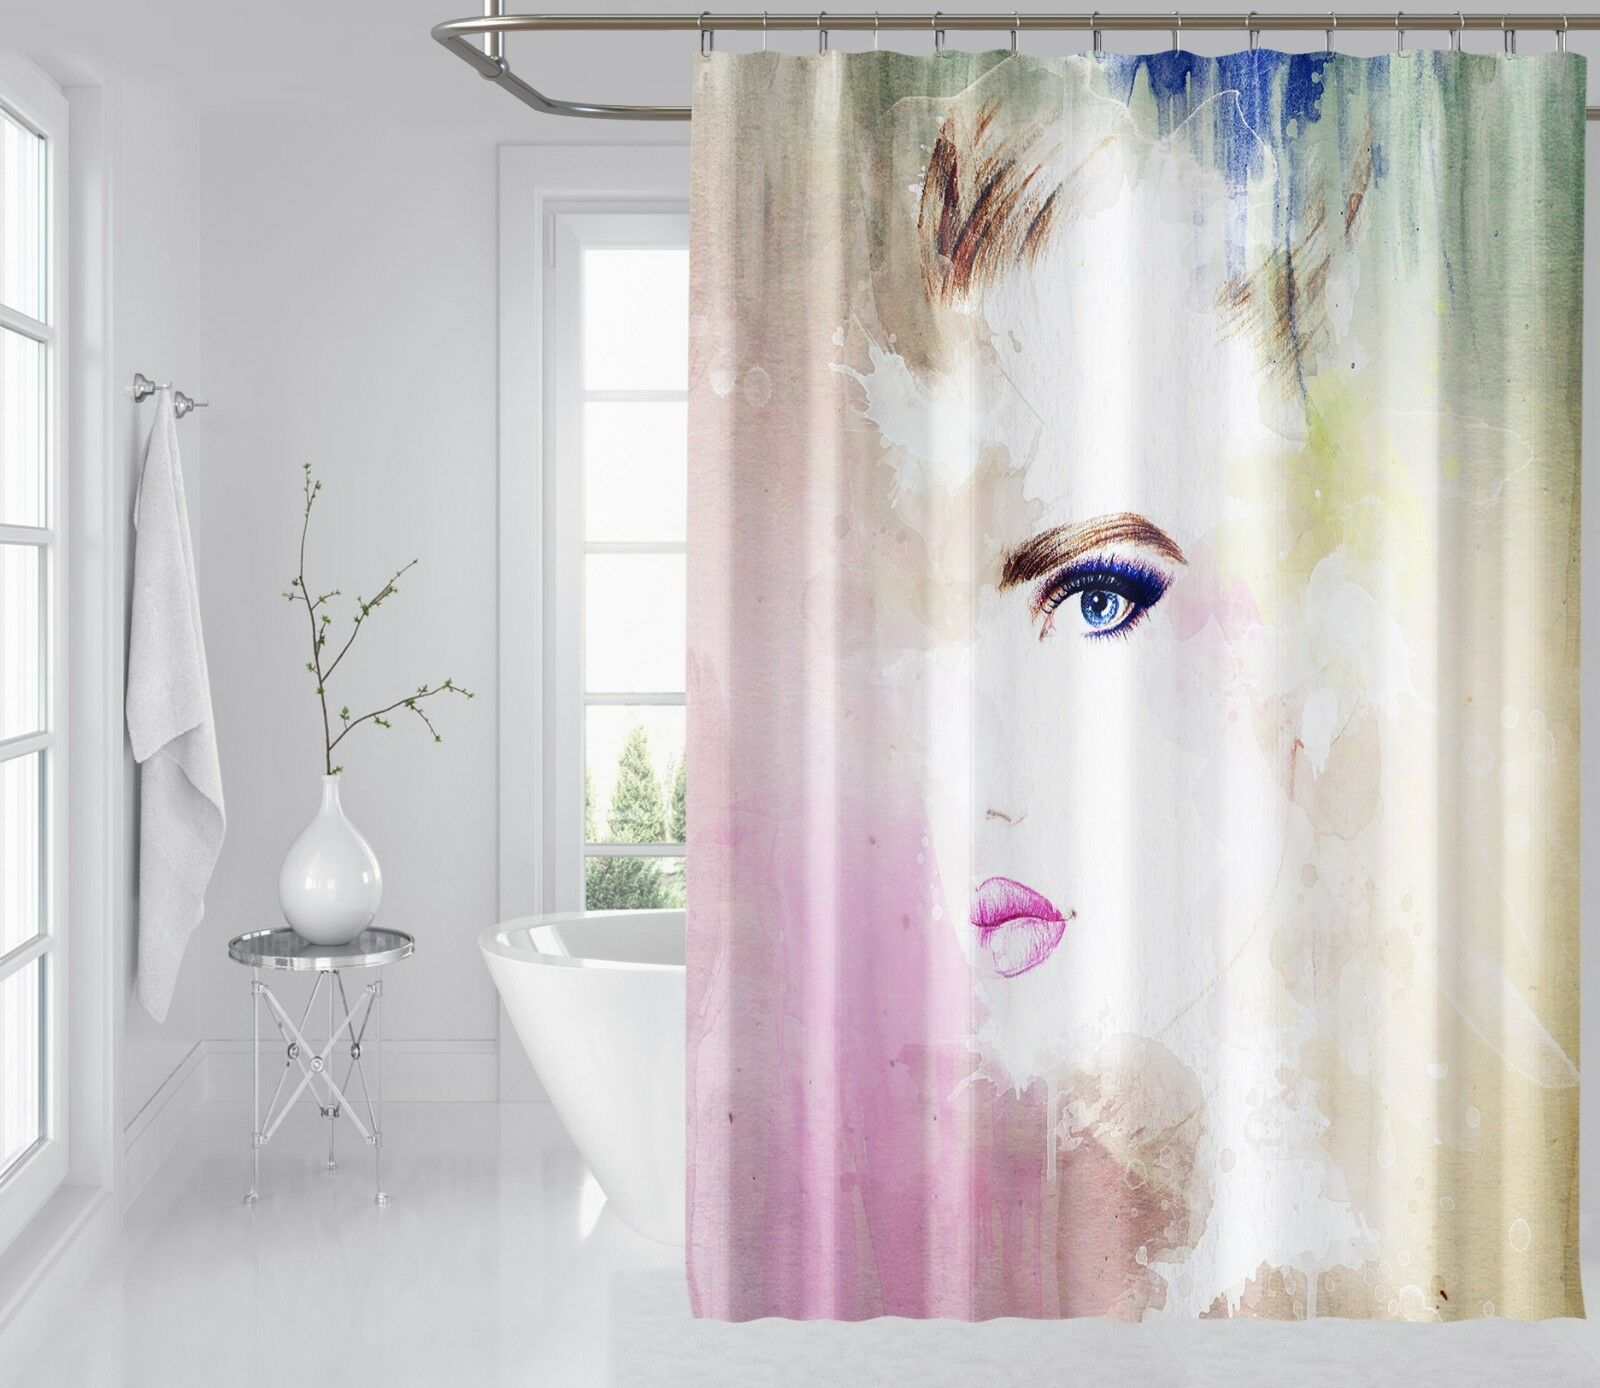 3D Viso vernice ART 8 Tenda da Doccia Impermeabile Bagno fibra Finestre Casa Bagno